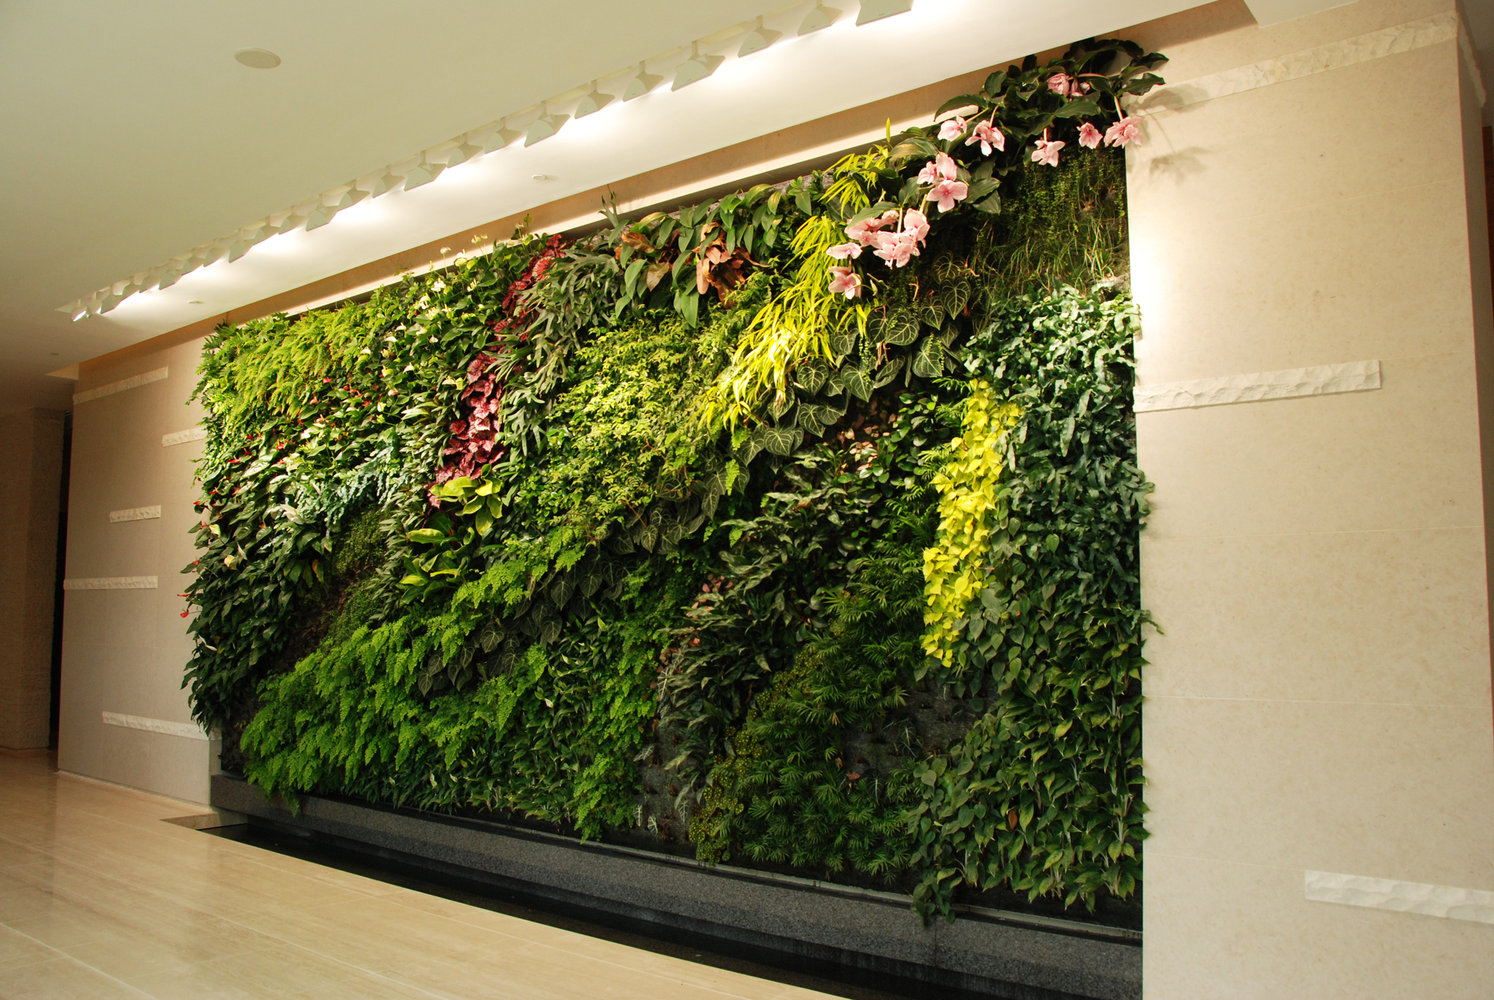 zeleni-zid-paneli-green-centar-vertikalna-basta